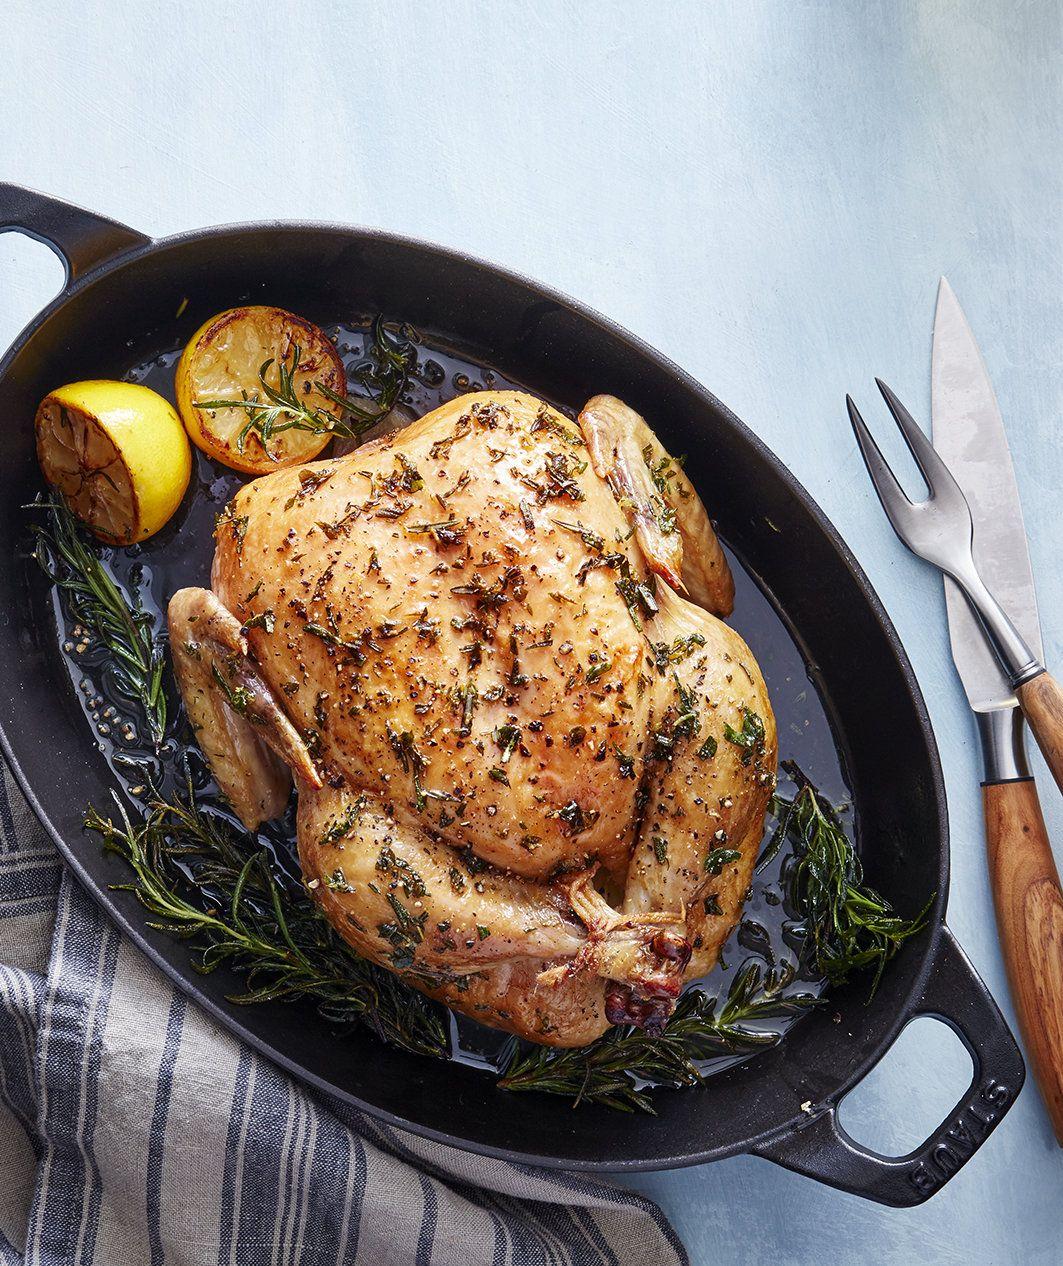 Make It Yourself SlowRoasted Lemon & Herb Chicken